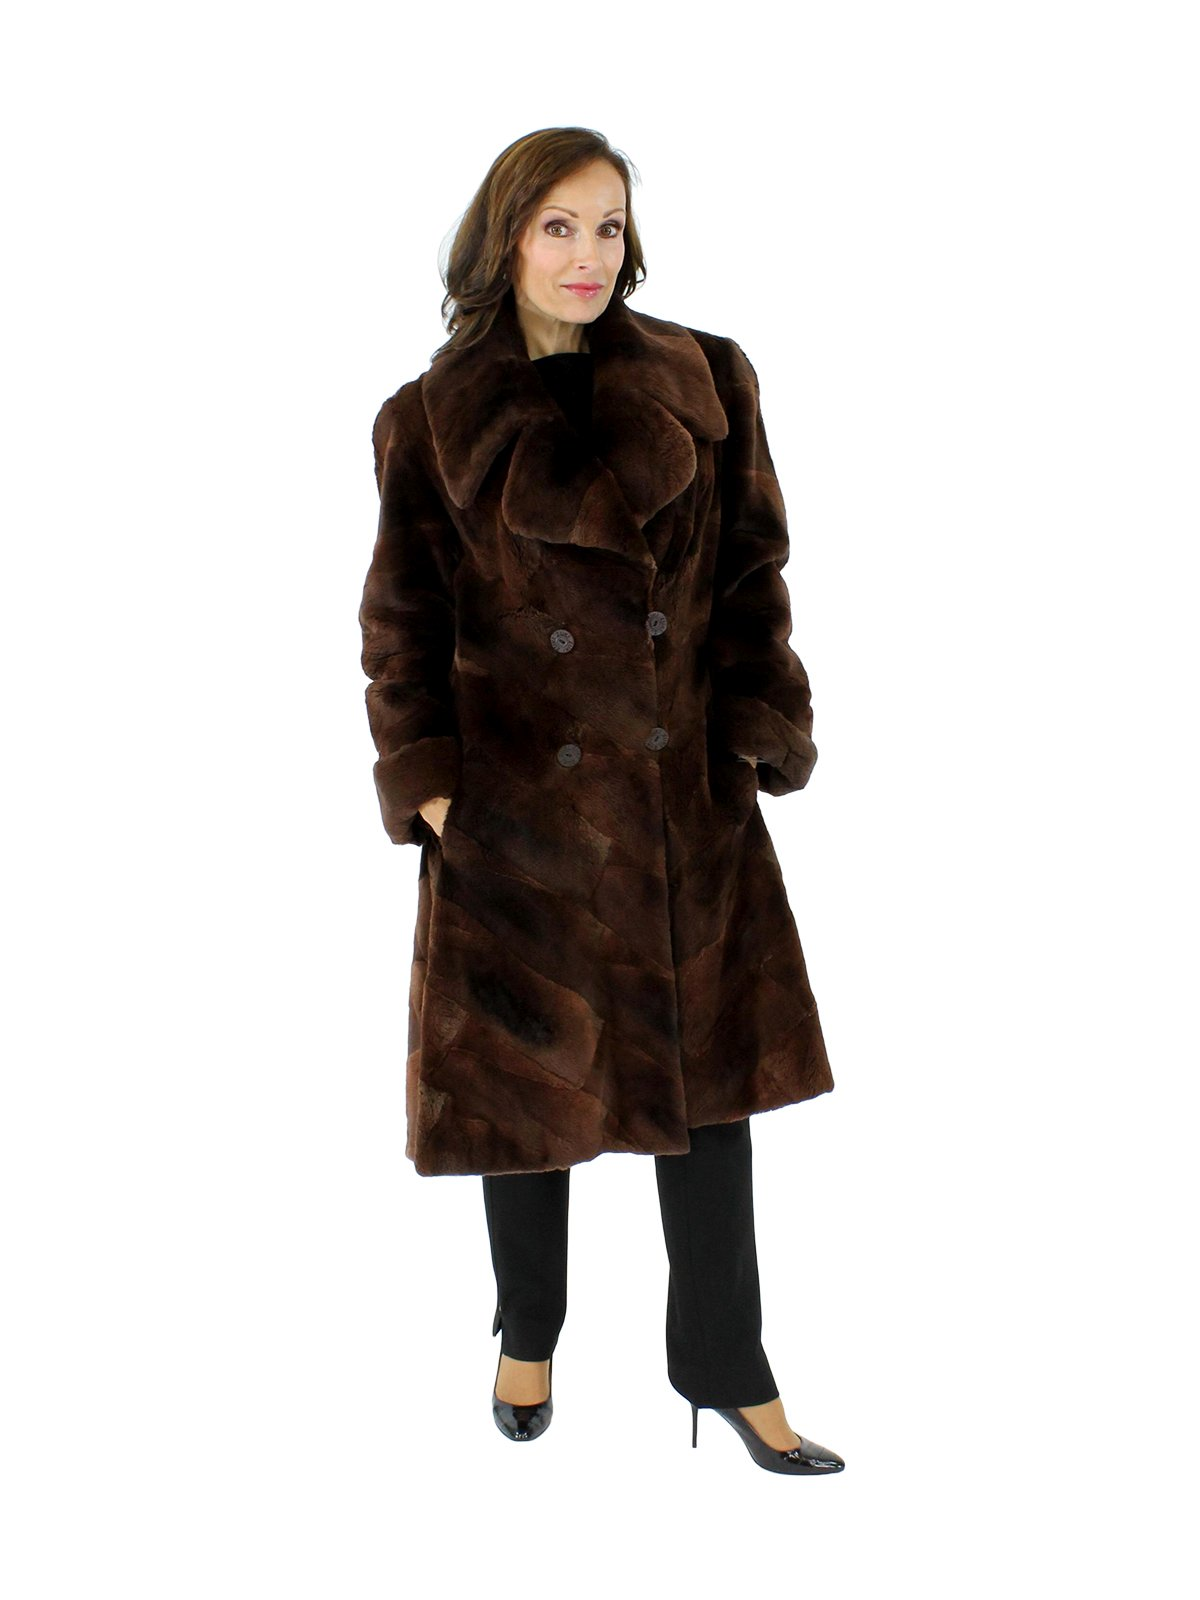 ca8750d89 Sheared Muskrat Fur Coat - Women's Small - Brown | Estate Furs